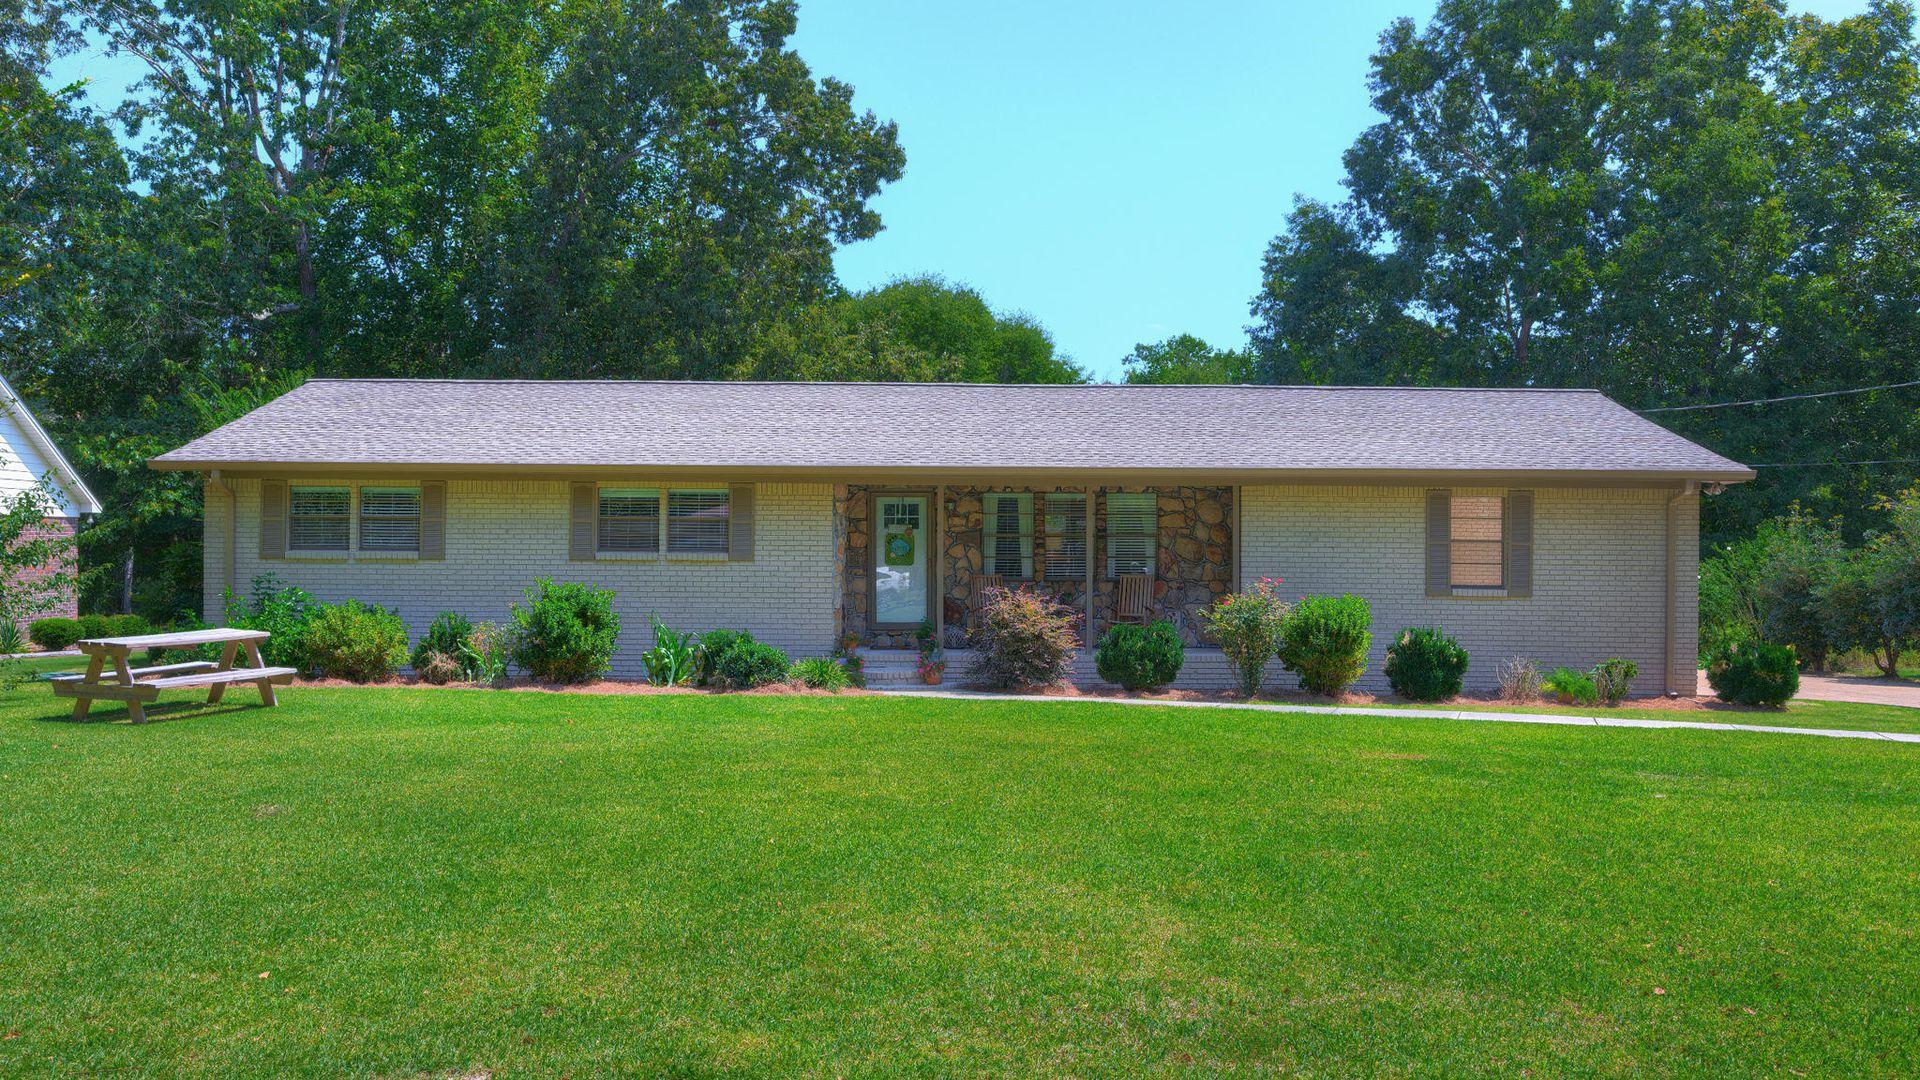 Jasper Real Estate - Jasper AL Homes For Sale   Zillow